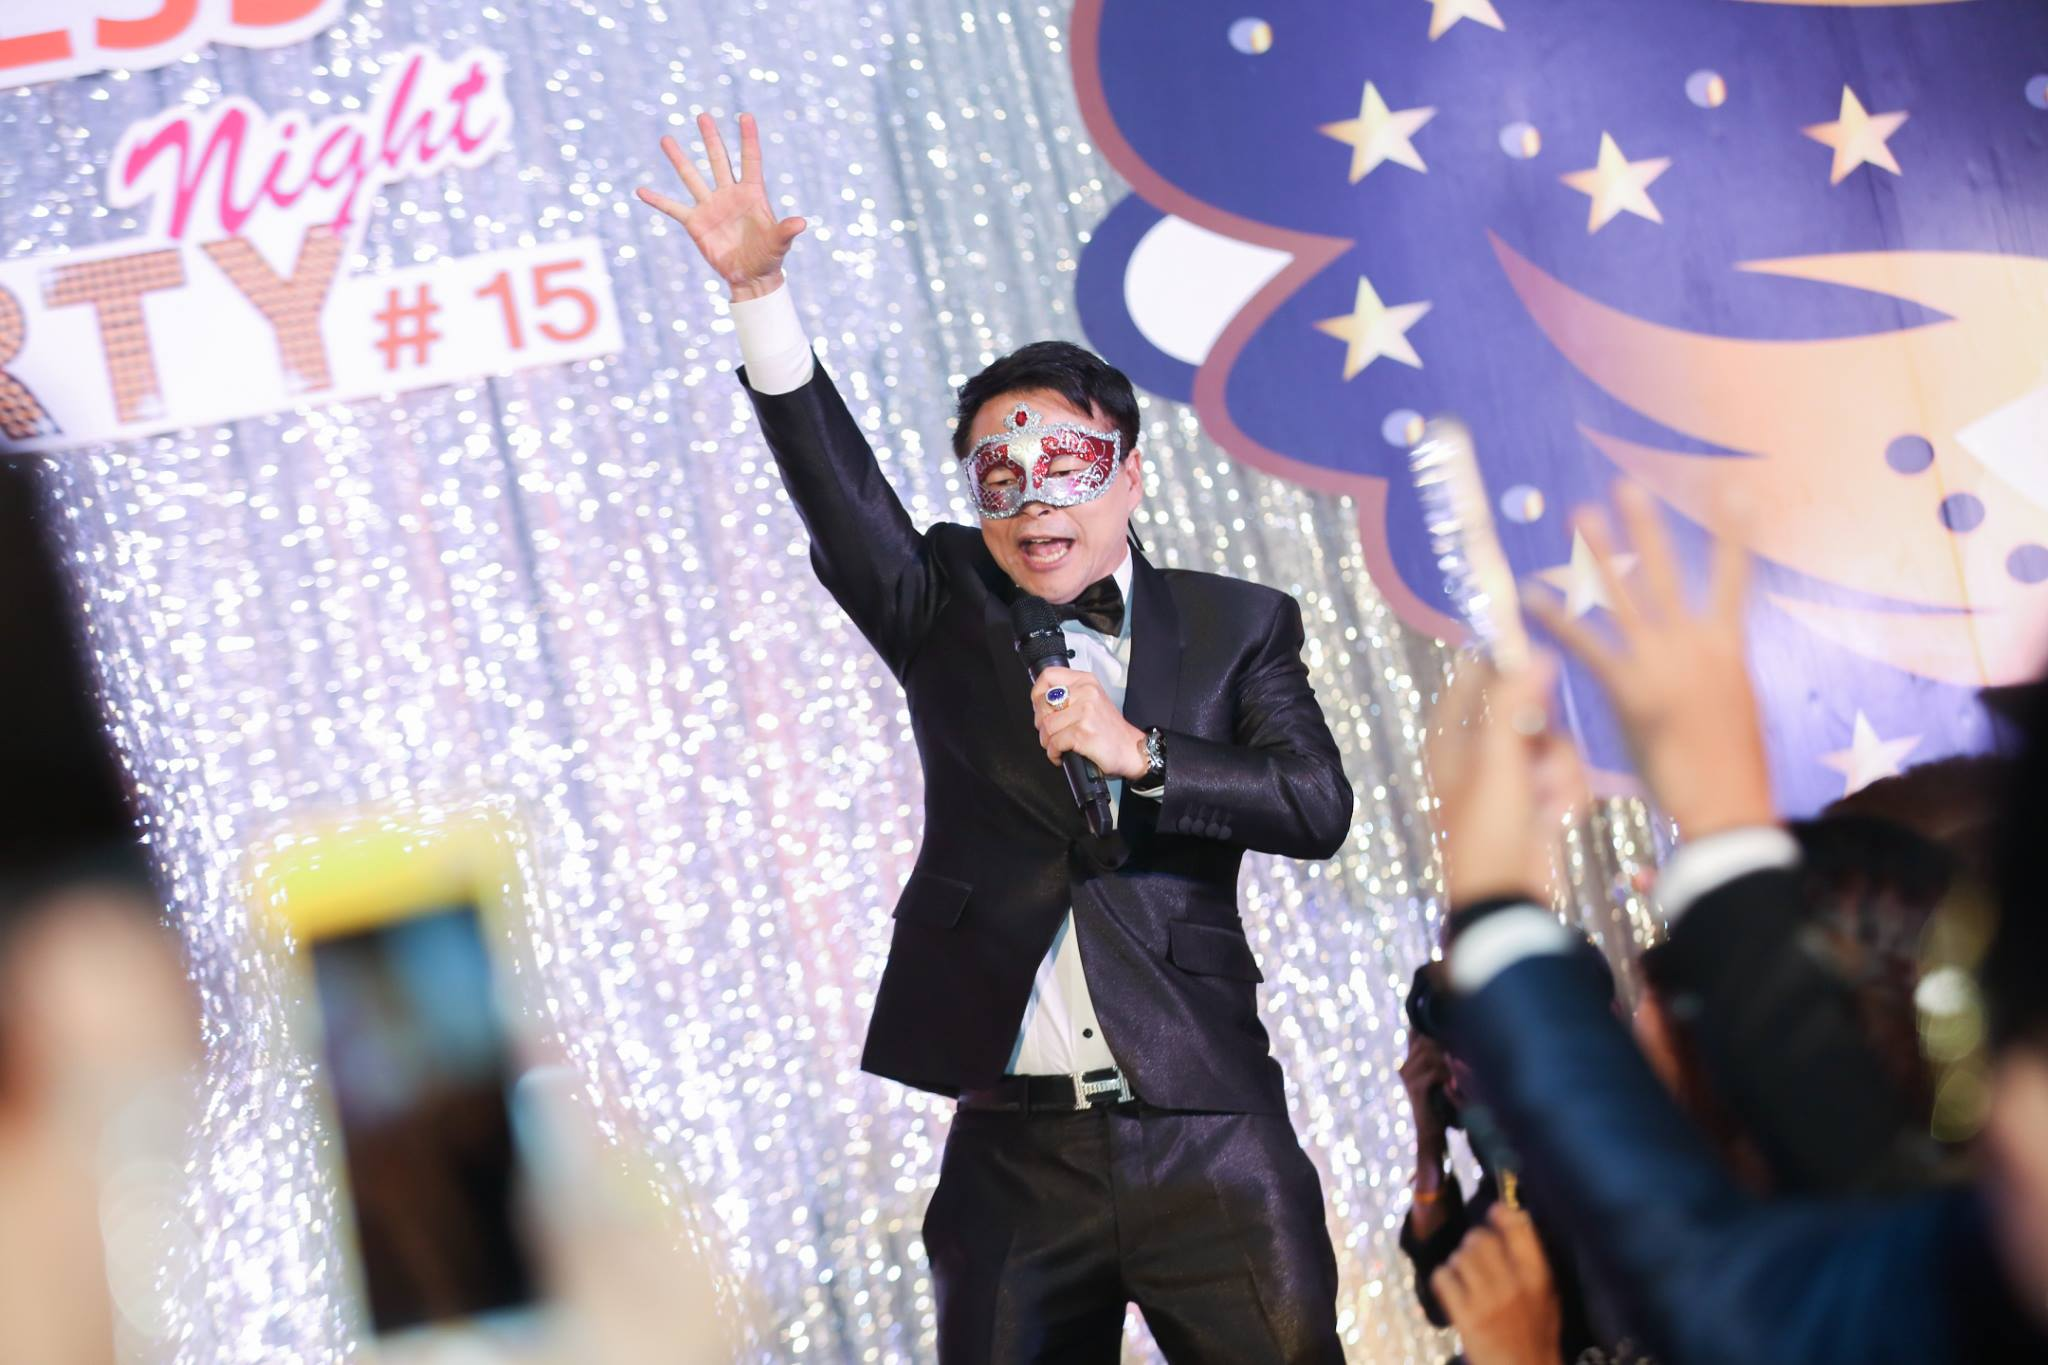 Success Night Party ครั้งที่ 15 (4)